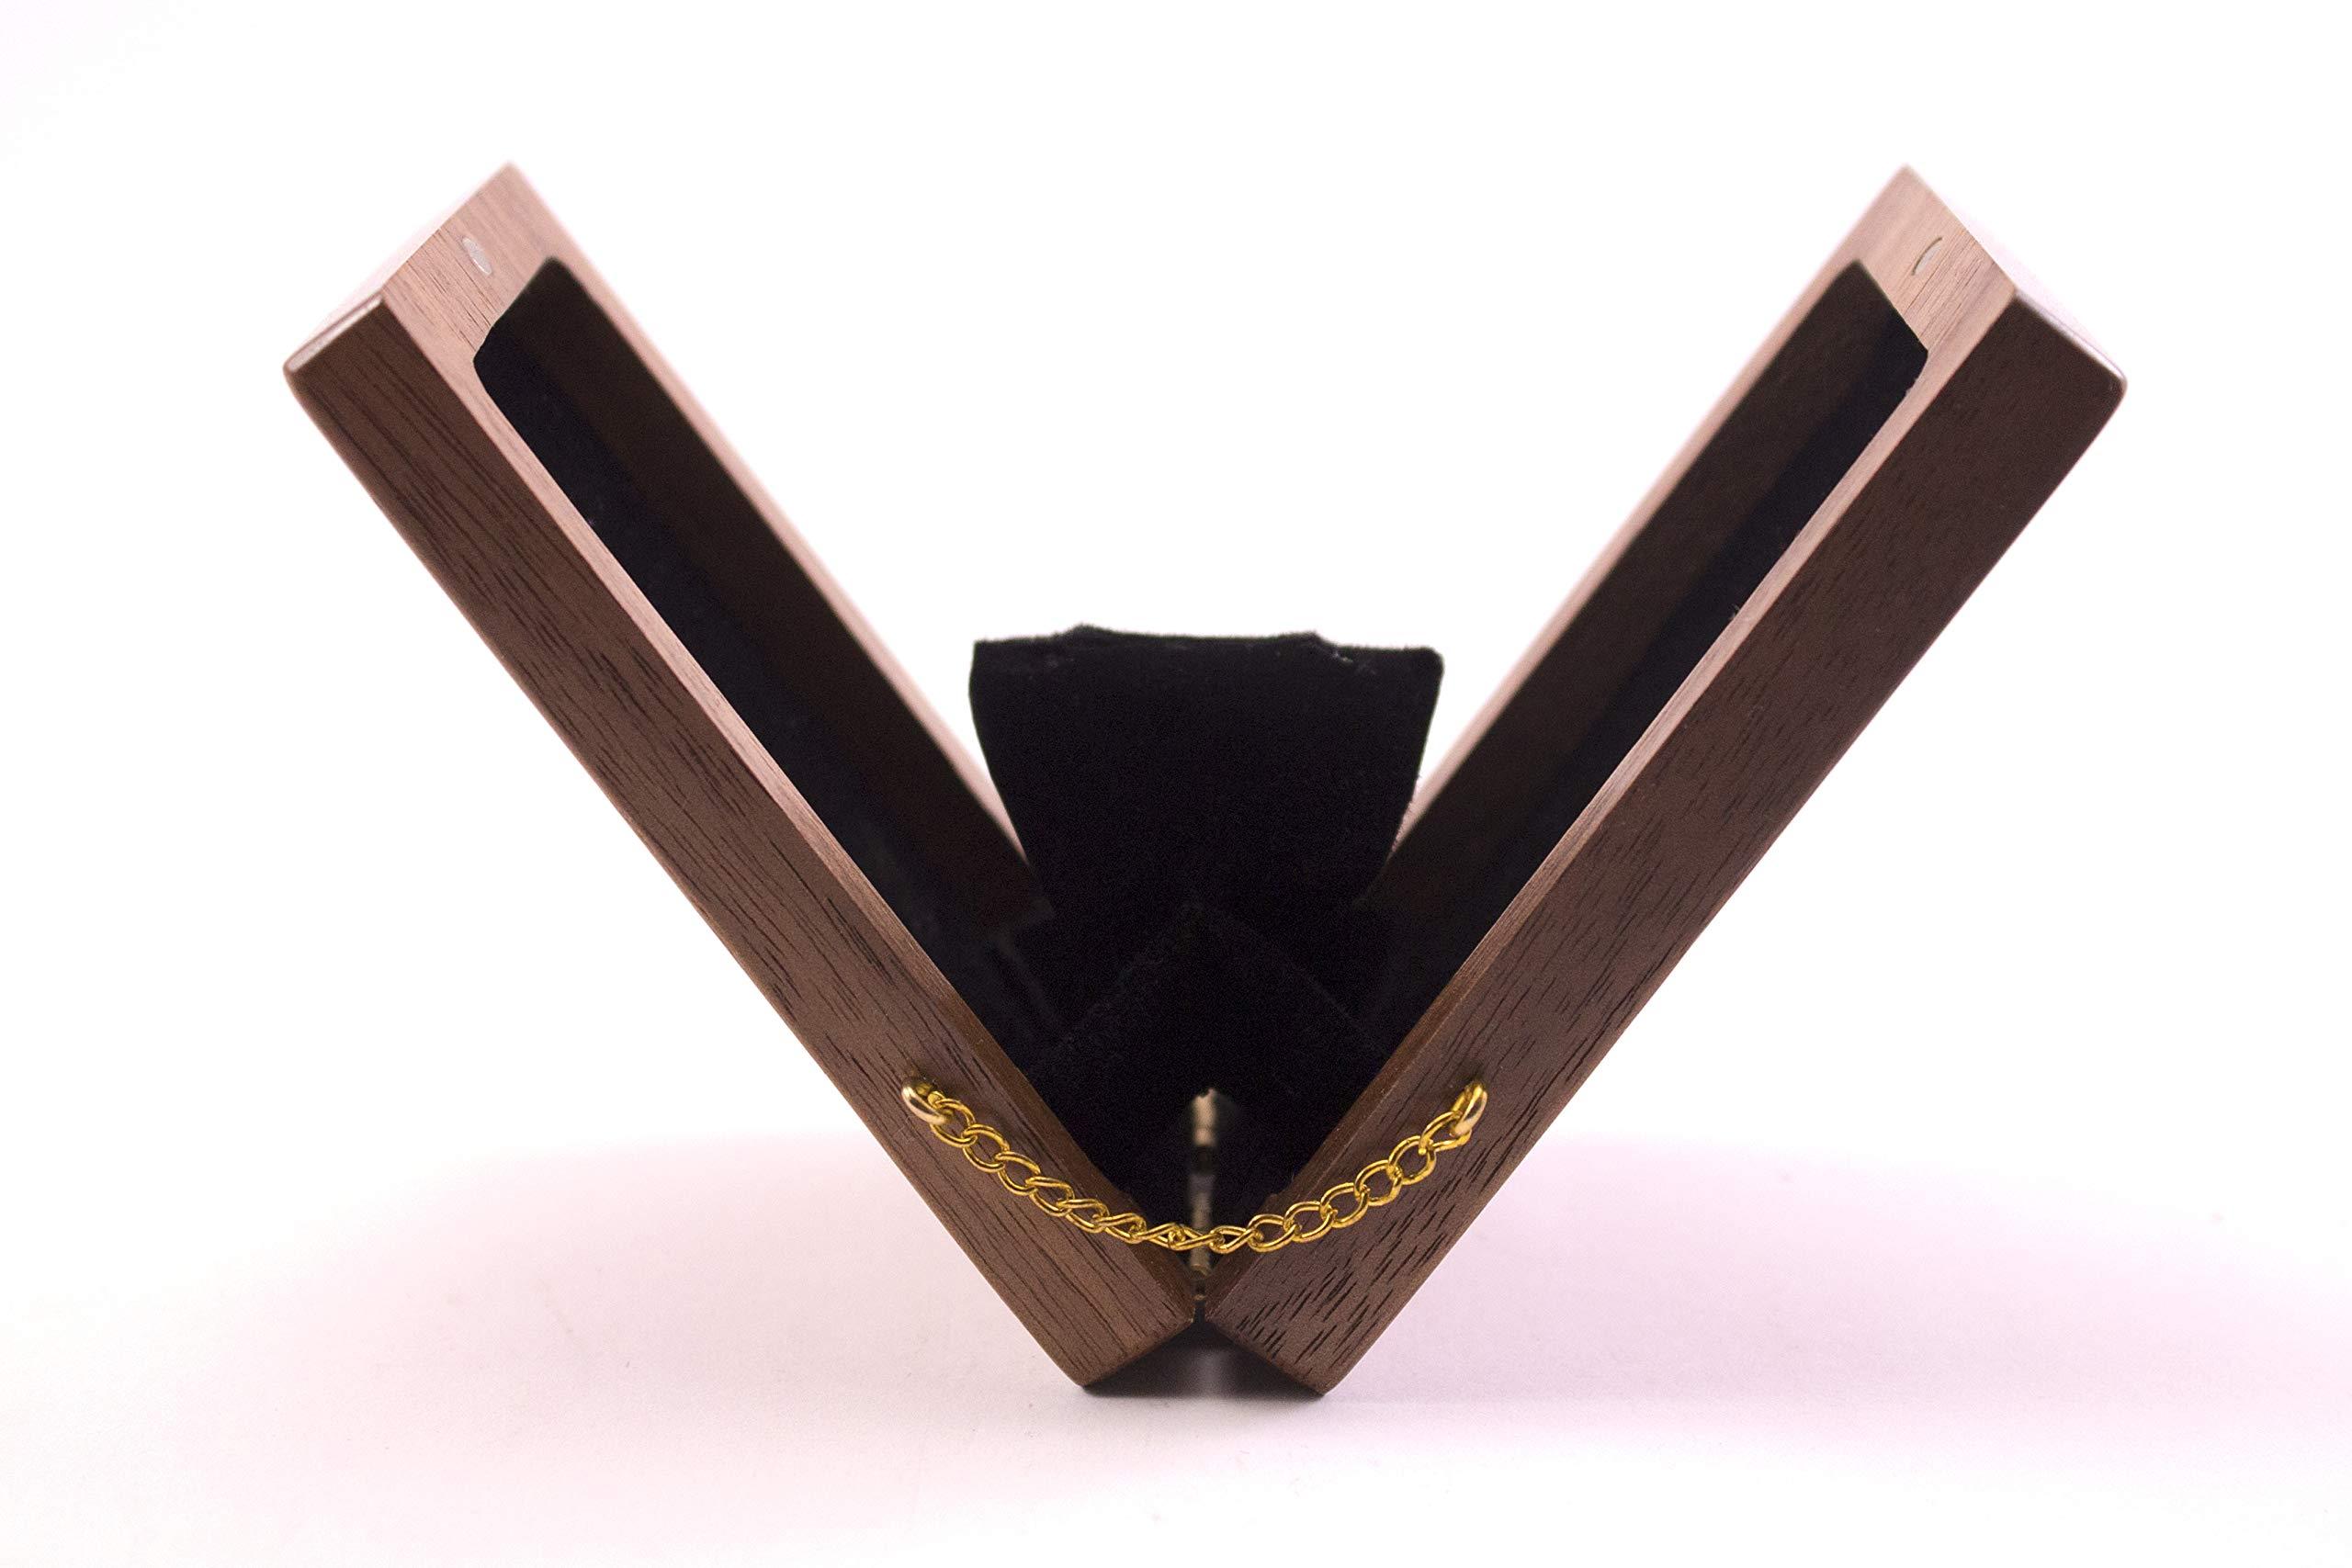 Engagement ring box Thin Wooden Ring Box - Proposal, Slim, Unique Proposal Ring Box - Walnut